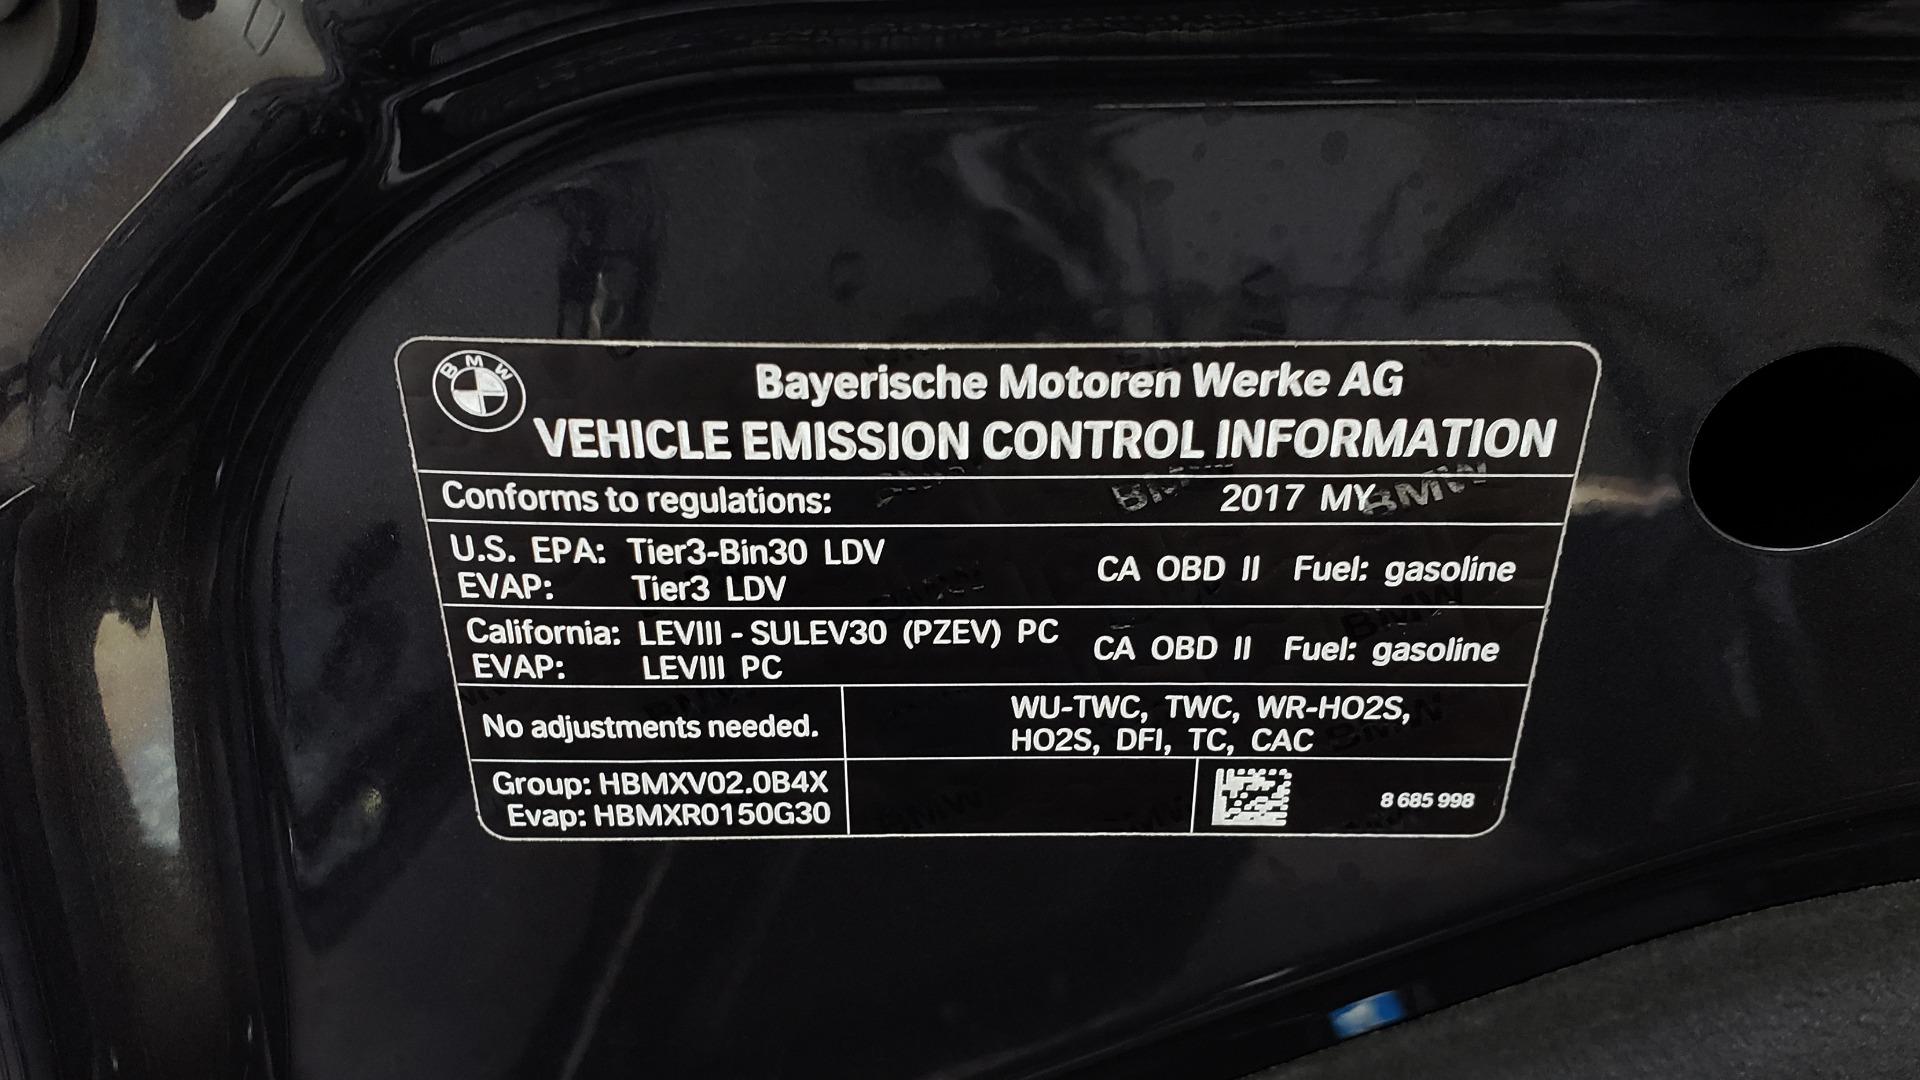 Used 2017 BMW 5 SERIES 530IXDRIVE / PREM PKG / DRVR ASST PLUS / CLD WTHR / APPLE CARPLAY for sale Sold at Formula Imports in Charlotte NC 28227 12